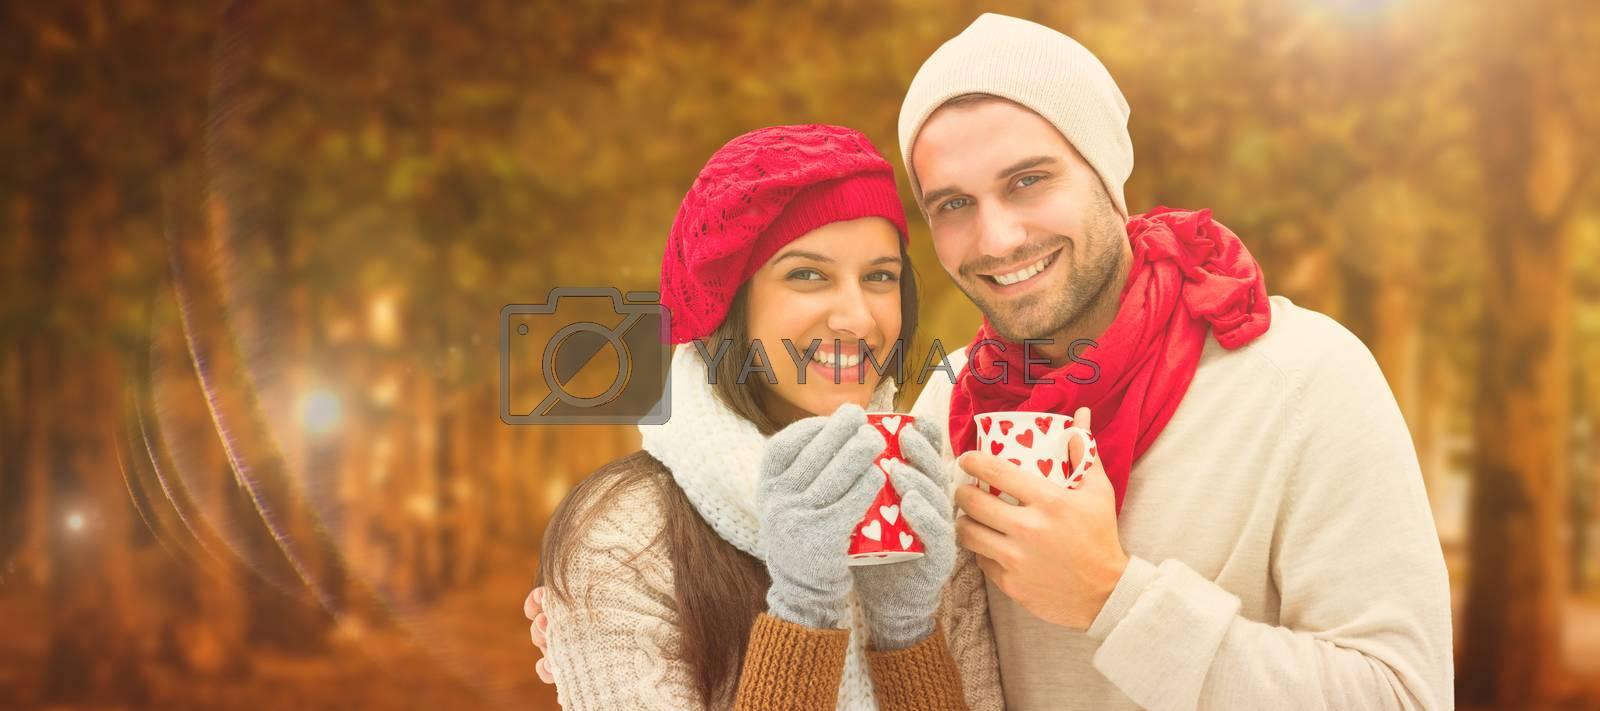 Winter couple holding mugs against autumn scene